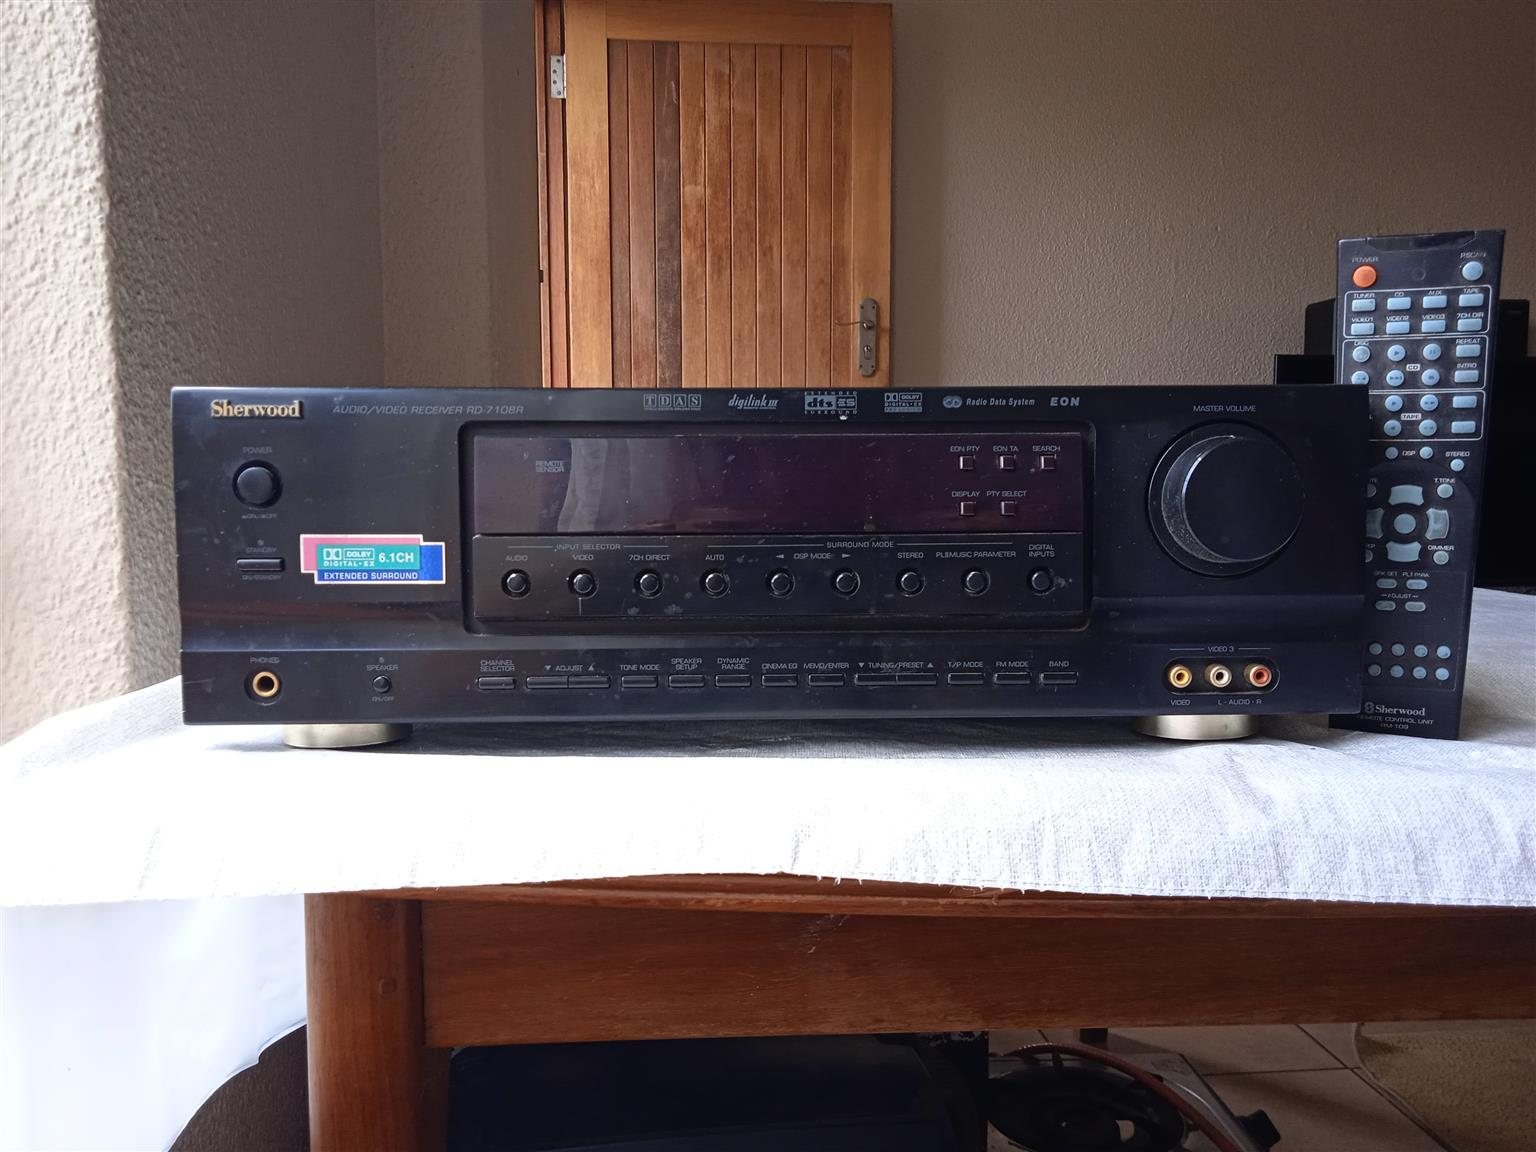 Sherwood RD7108R receiver